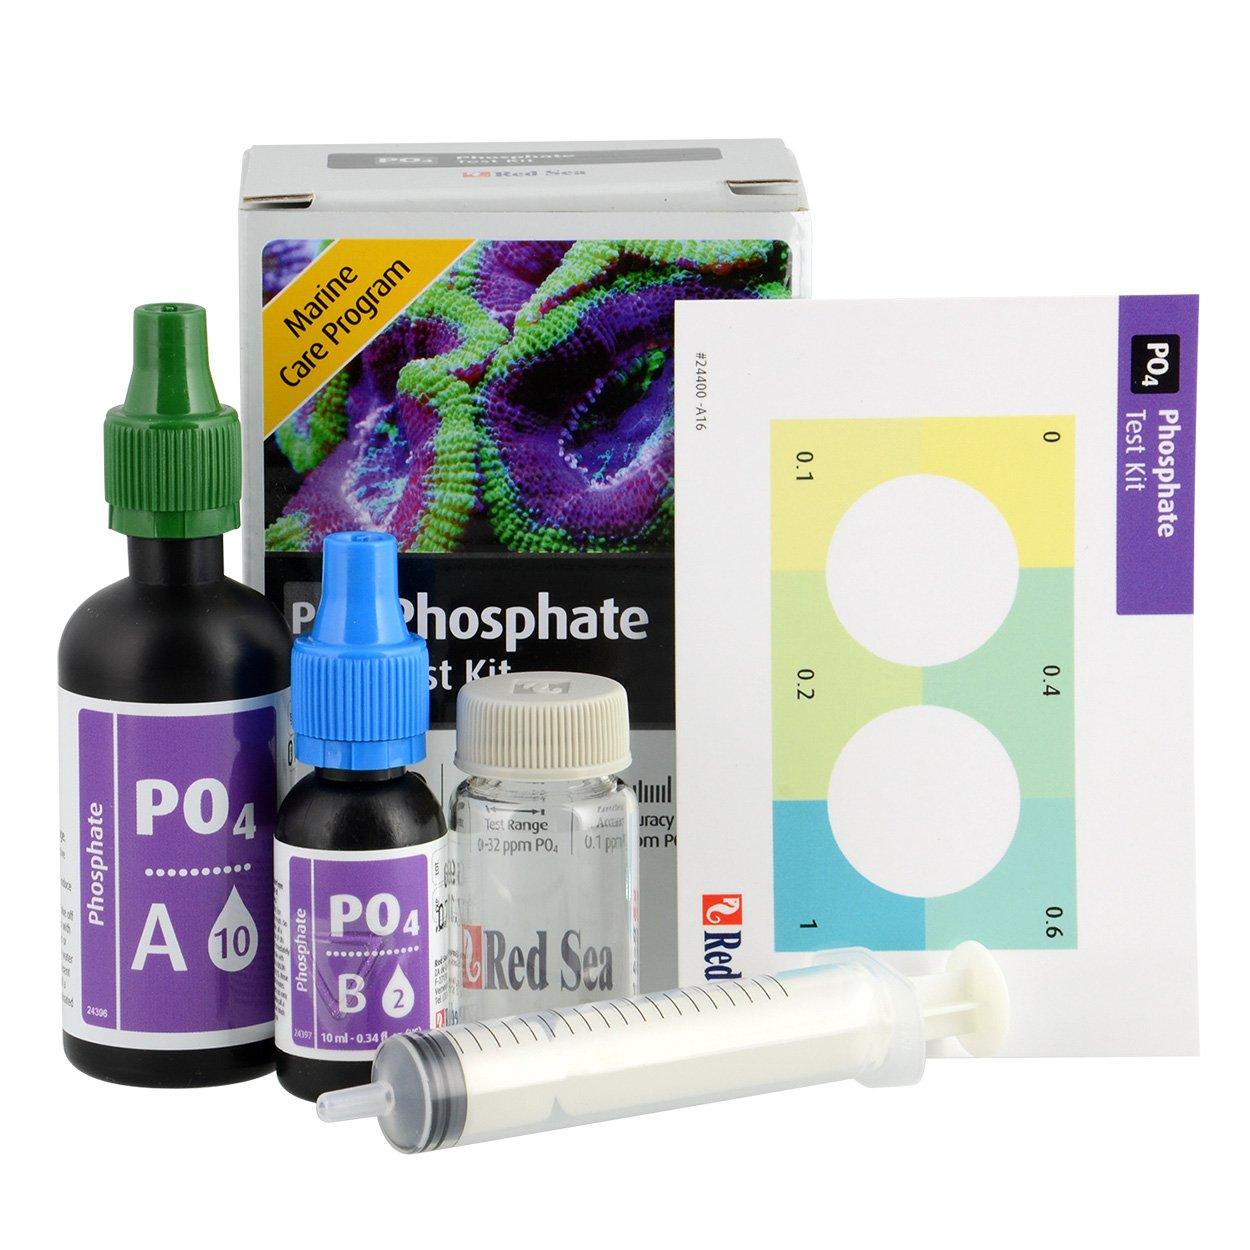 Red Sea MCP Phosphate (PO4) Test Kit Saltwater Aquariums